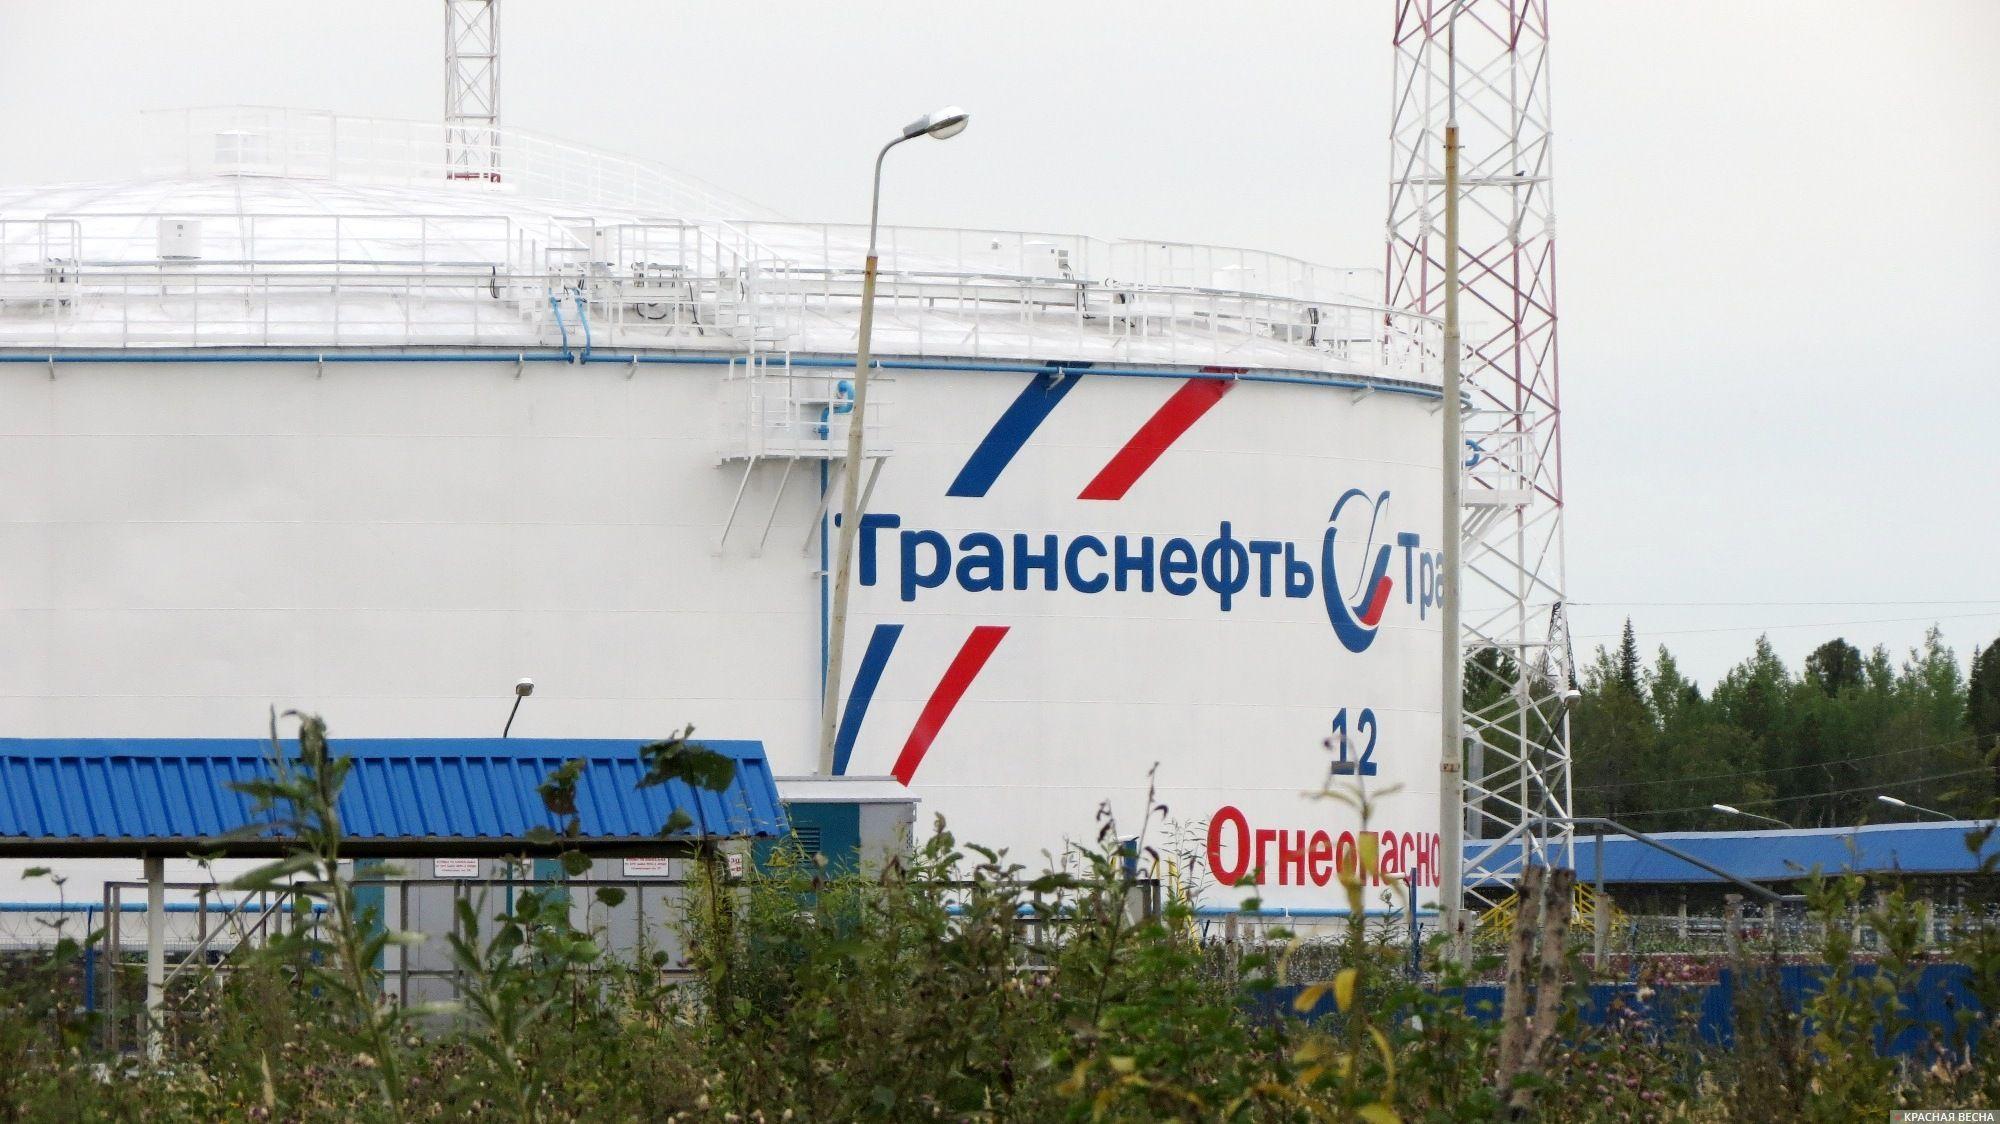 Нефтяной резервуар. Транснефть